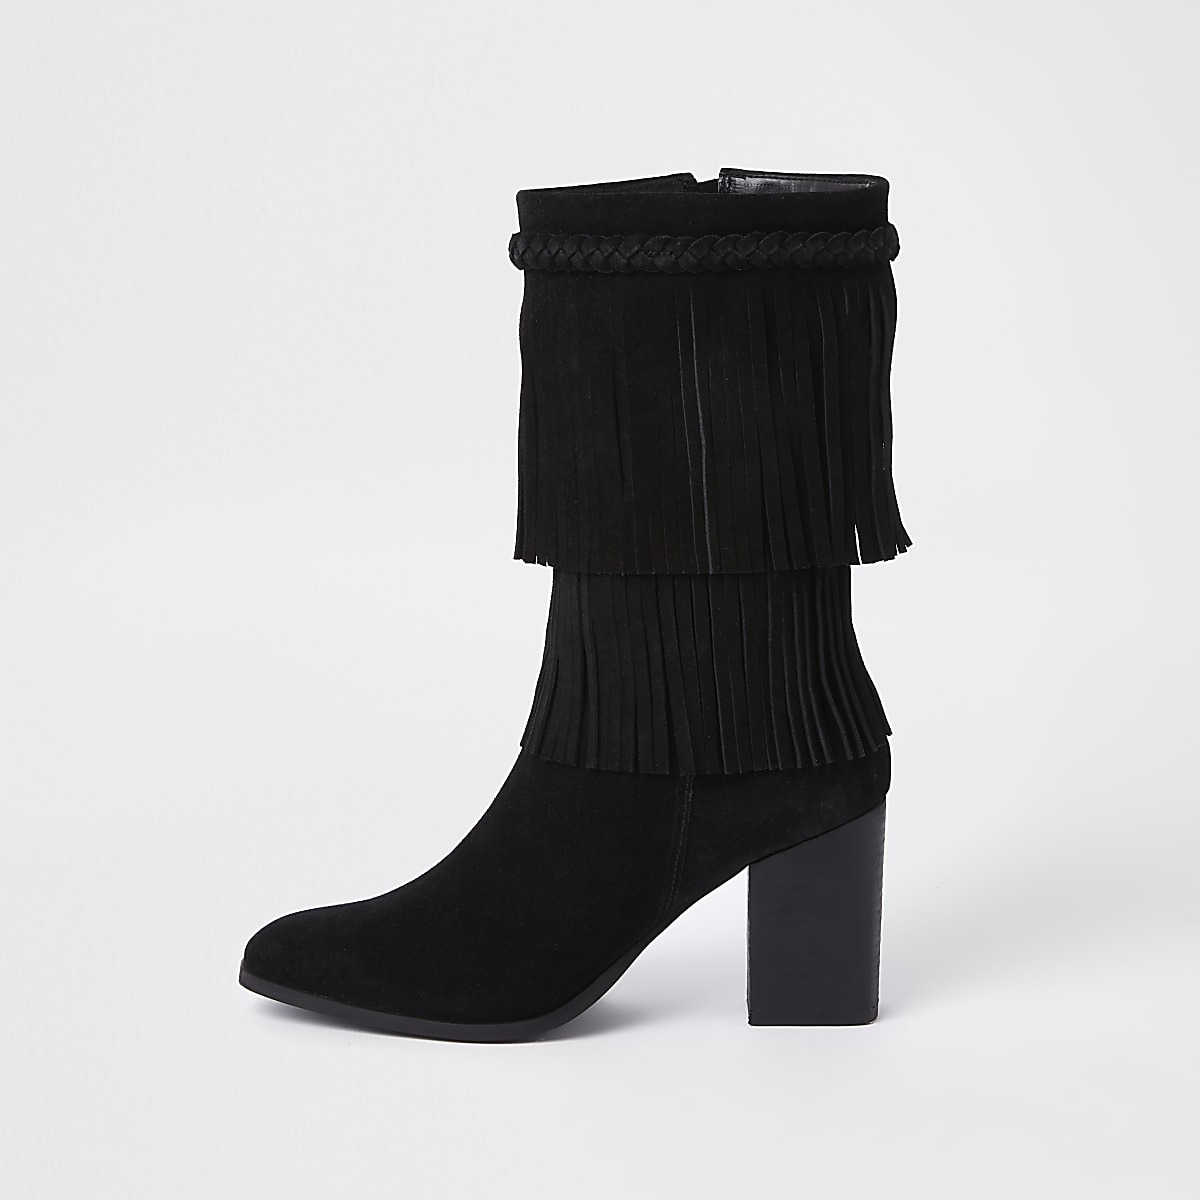 Zwarte suède laarzen met franje en blokhak